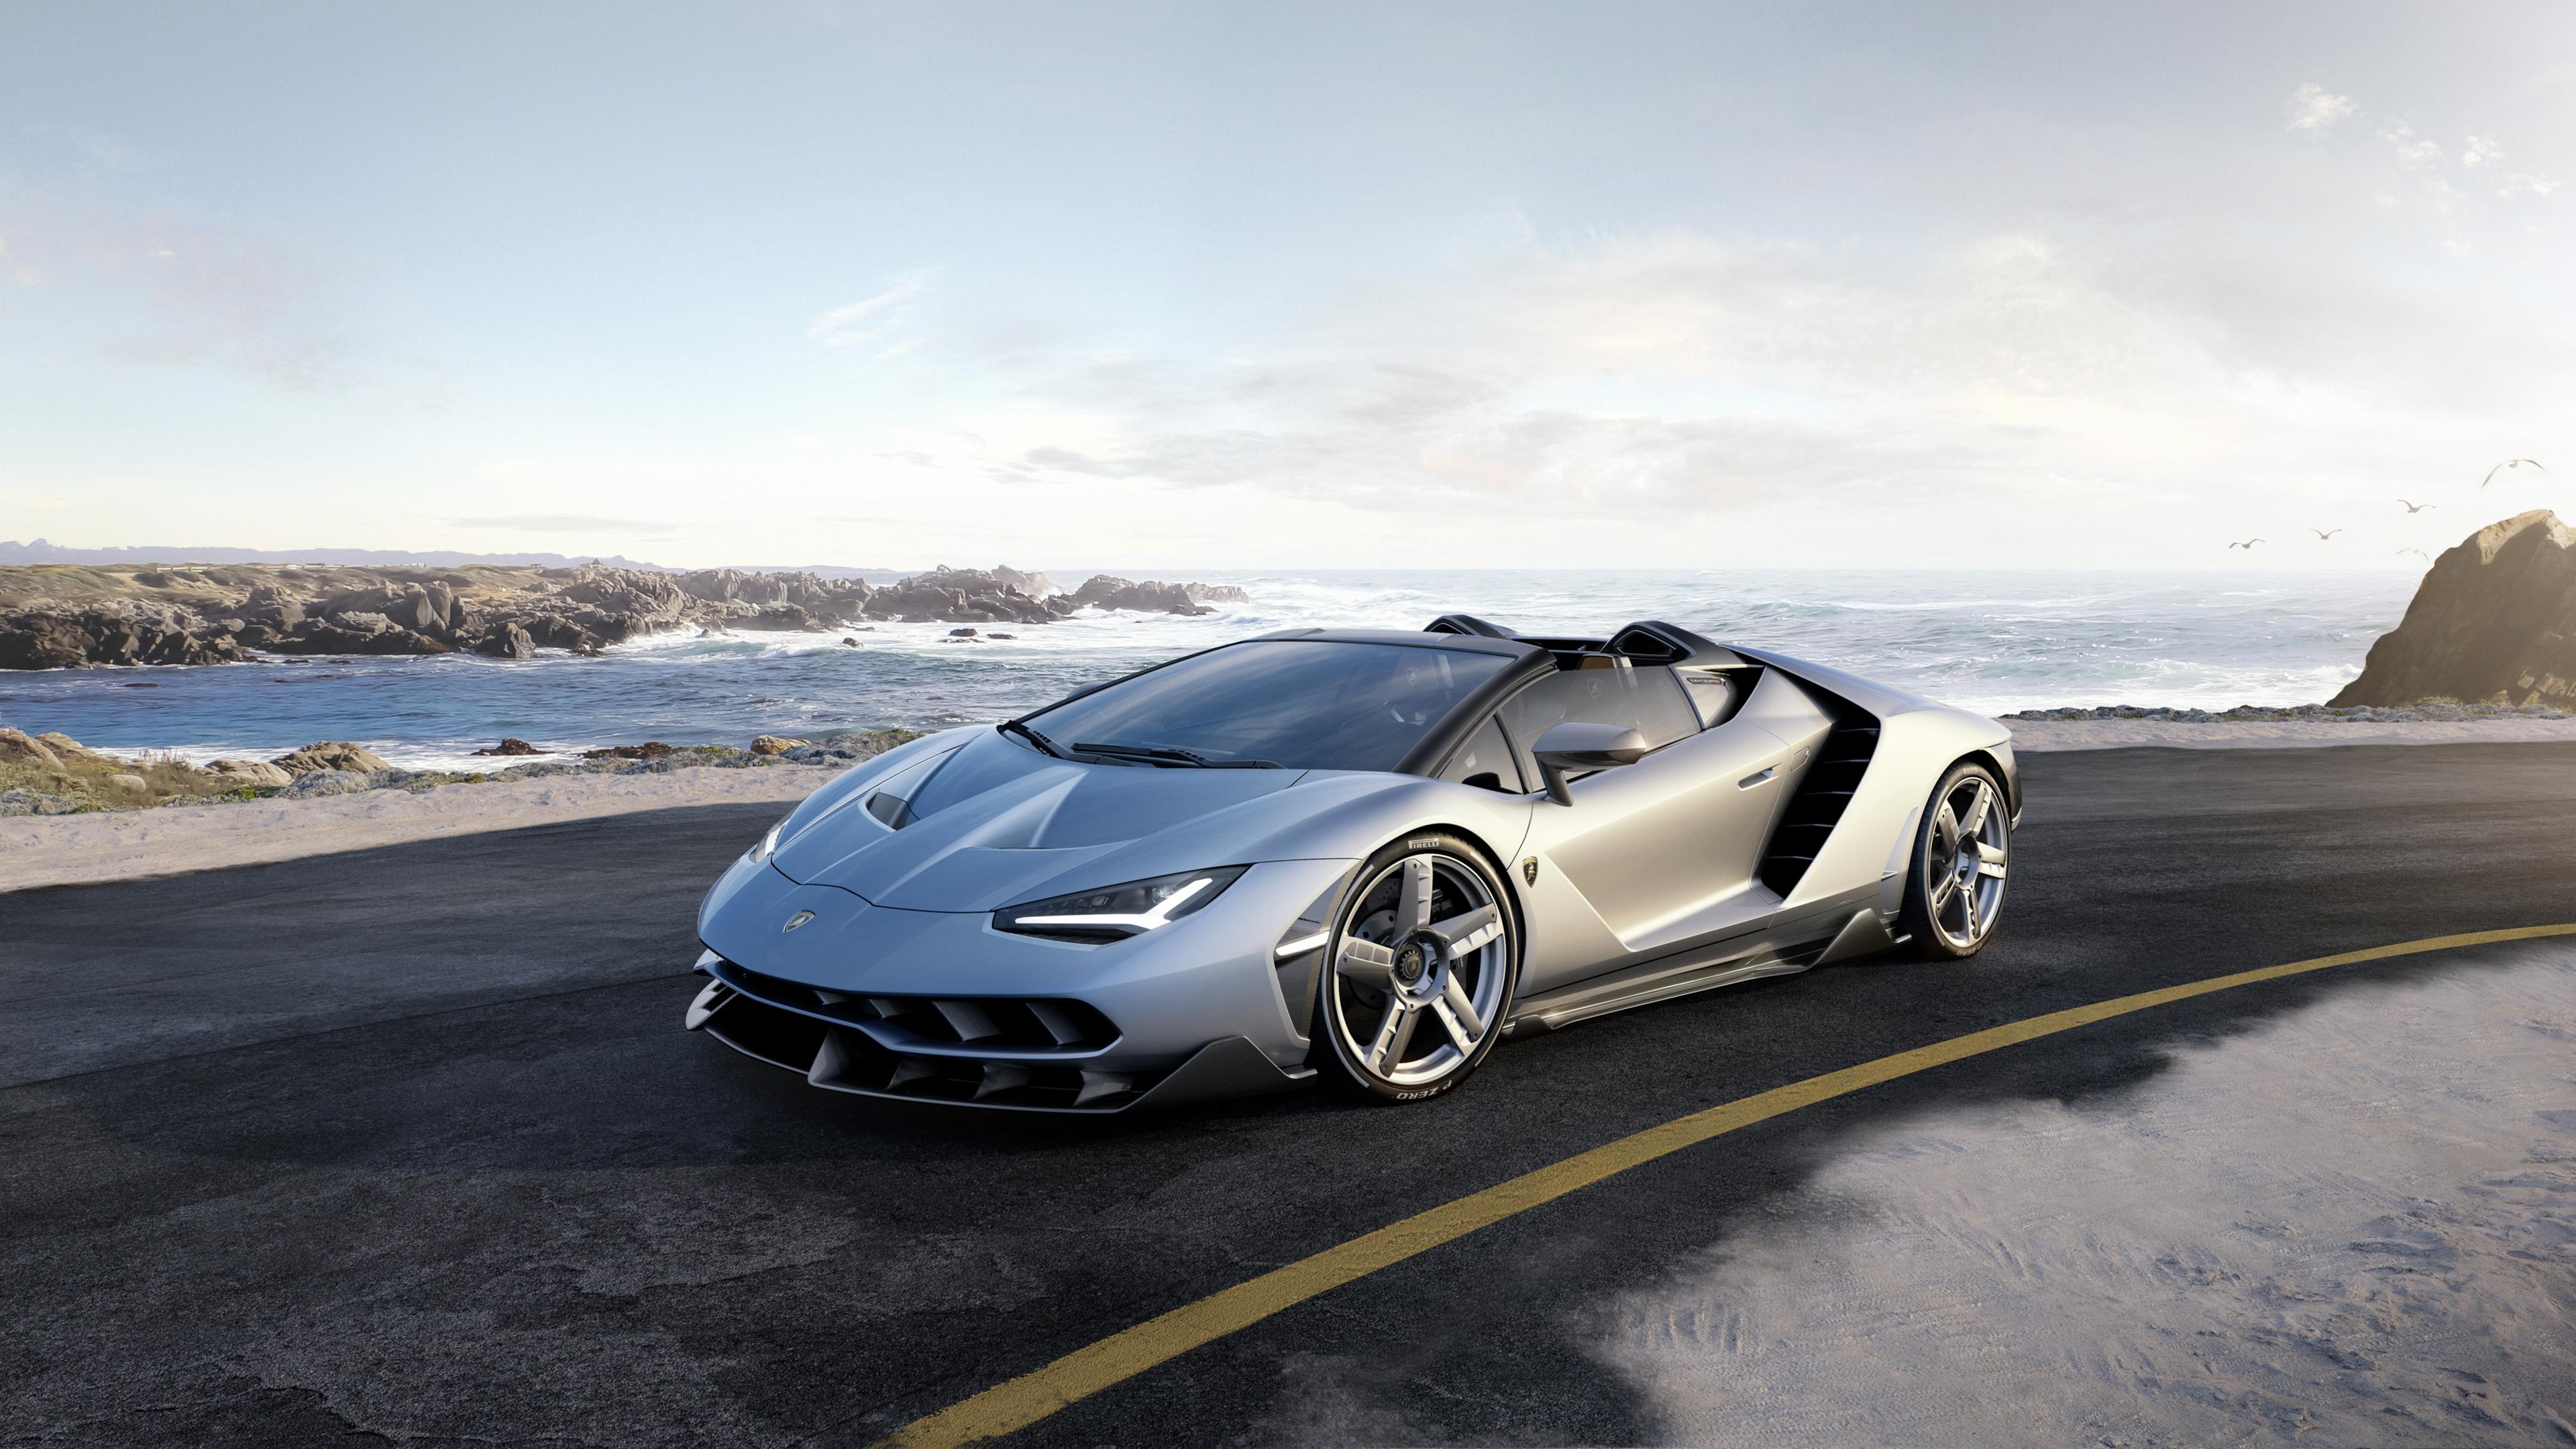 lamborghini centenario roadster 2017 1539104777 - Lamborghini Centenario Roadster 2017 - lamborghini centenario wallpapers, cars wallpapers, 2017 cars wallpapers